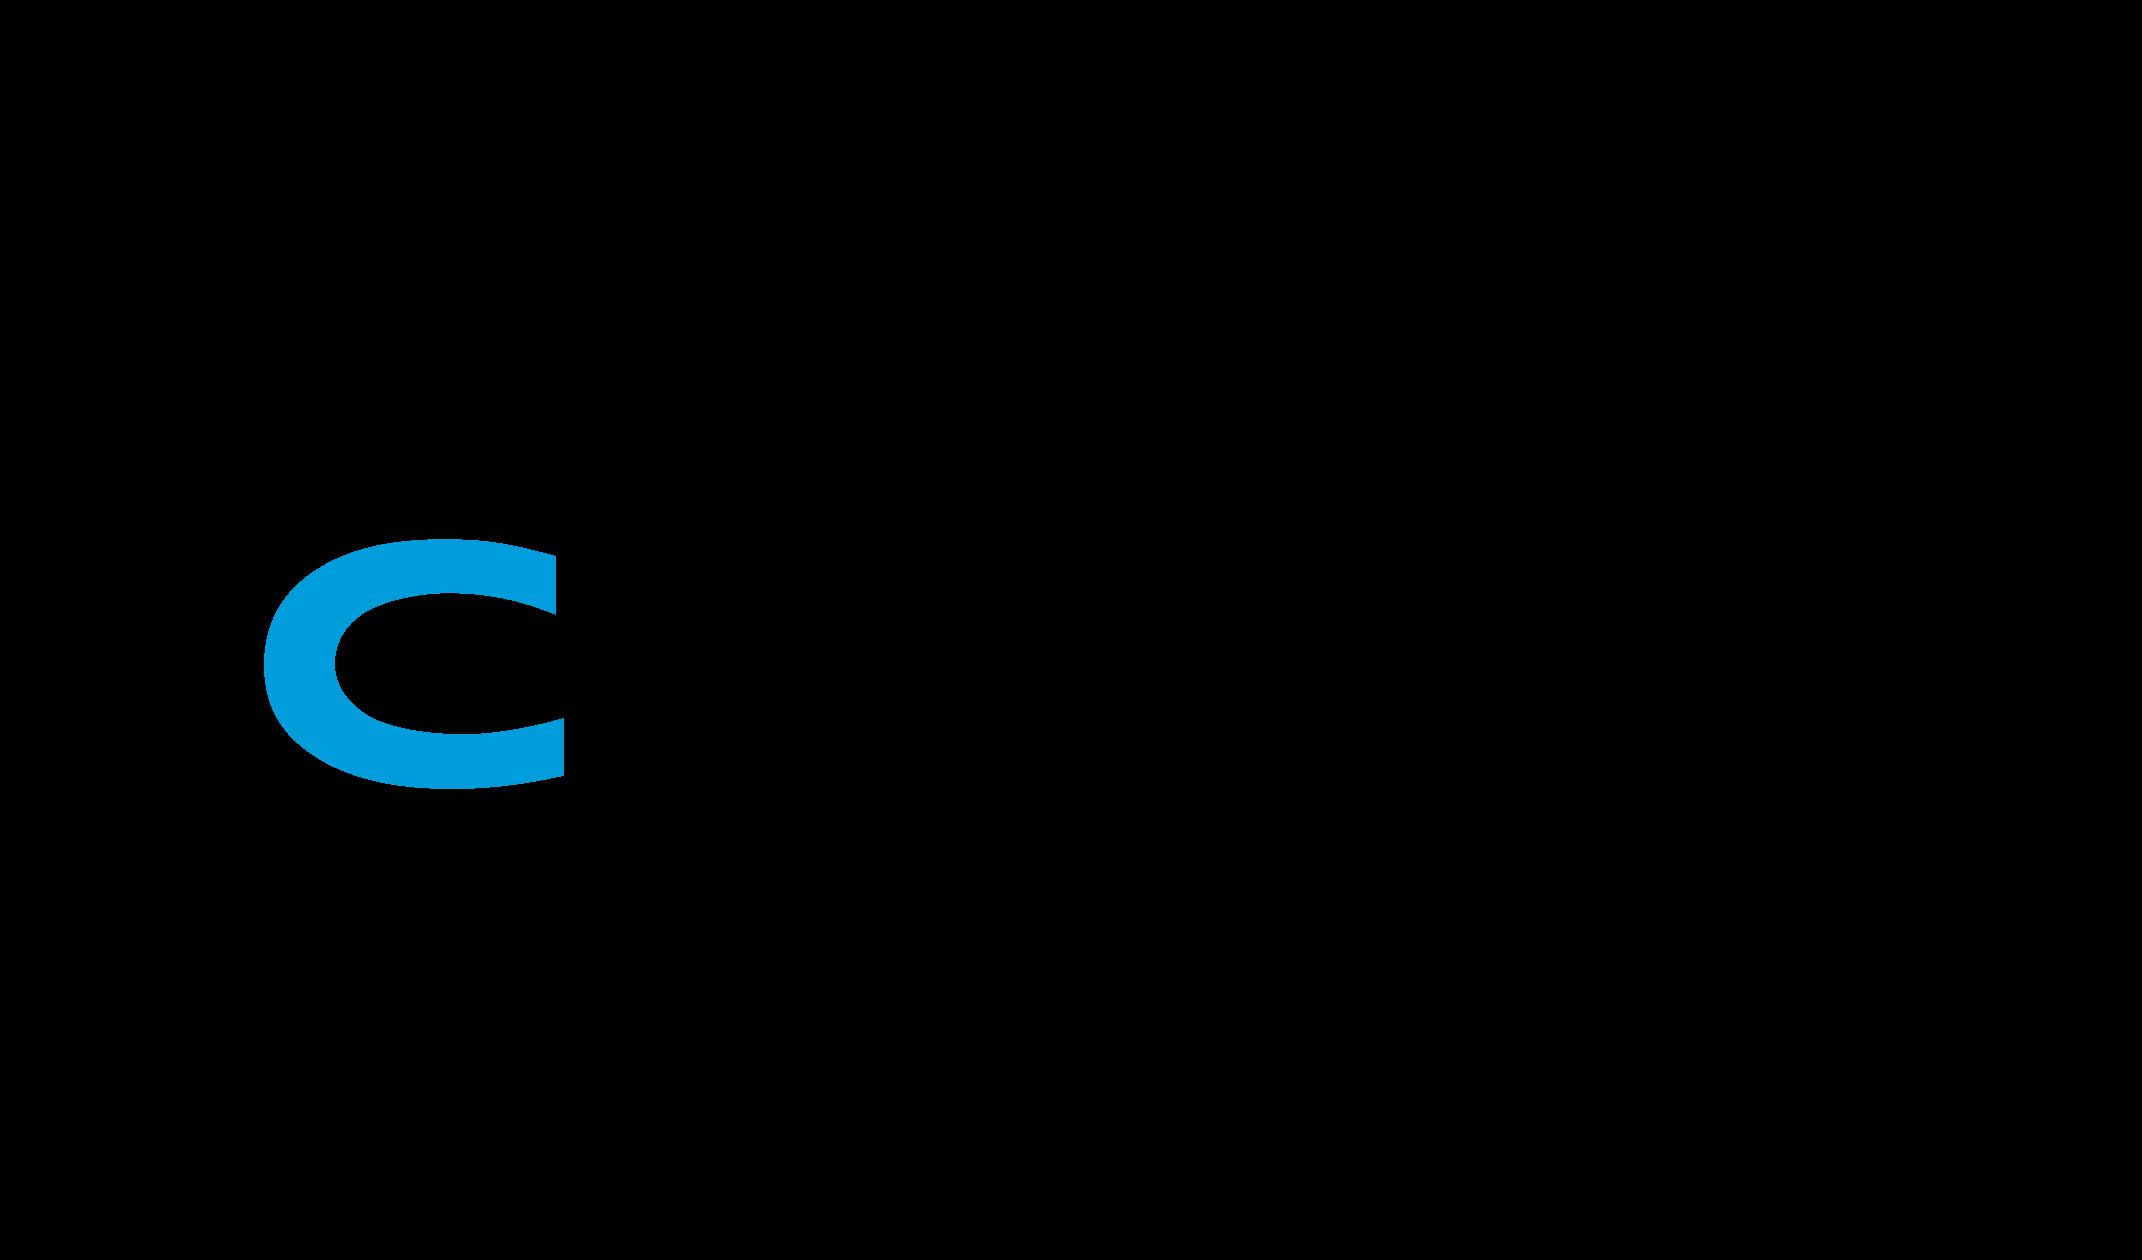 Cvent Virtual Attendee Hub logo